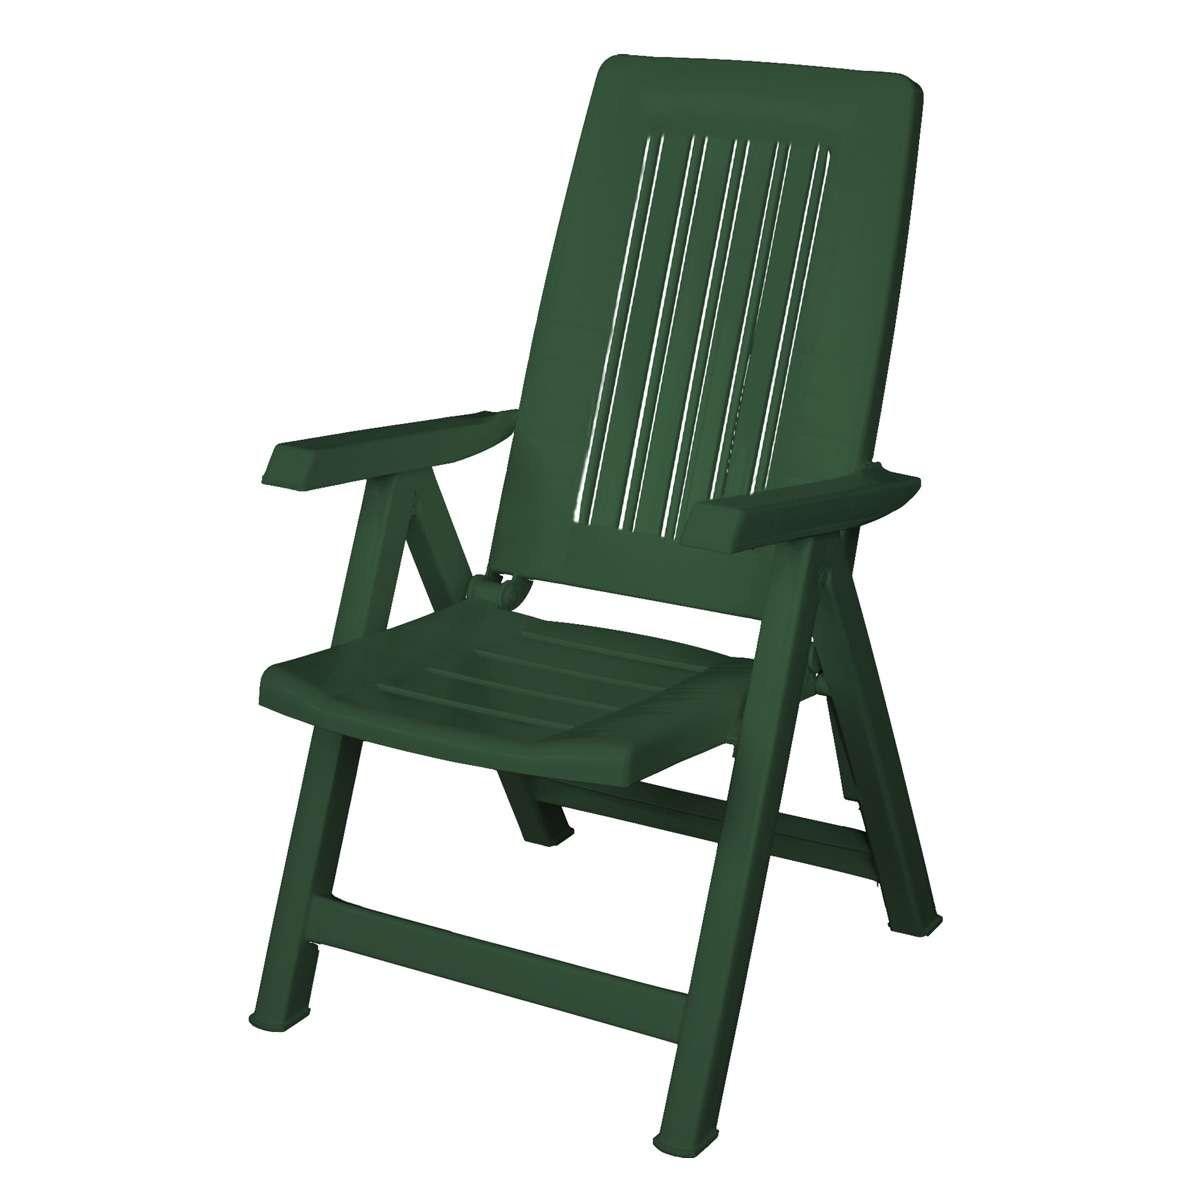 Chaise de jardin grosfillex vert - veranda-styledevie.fr